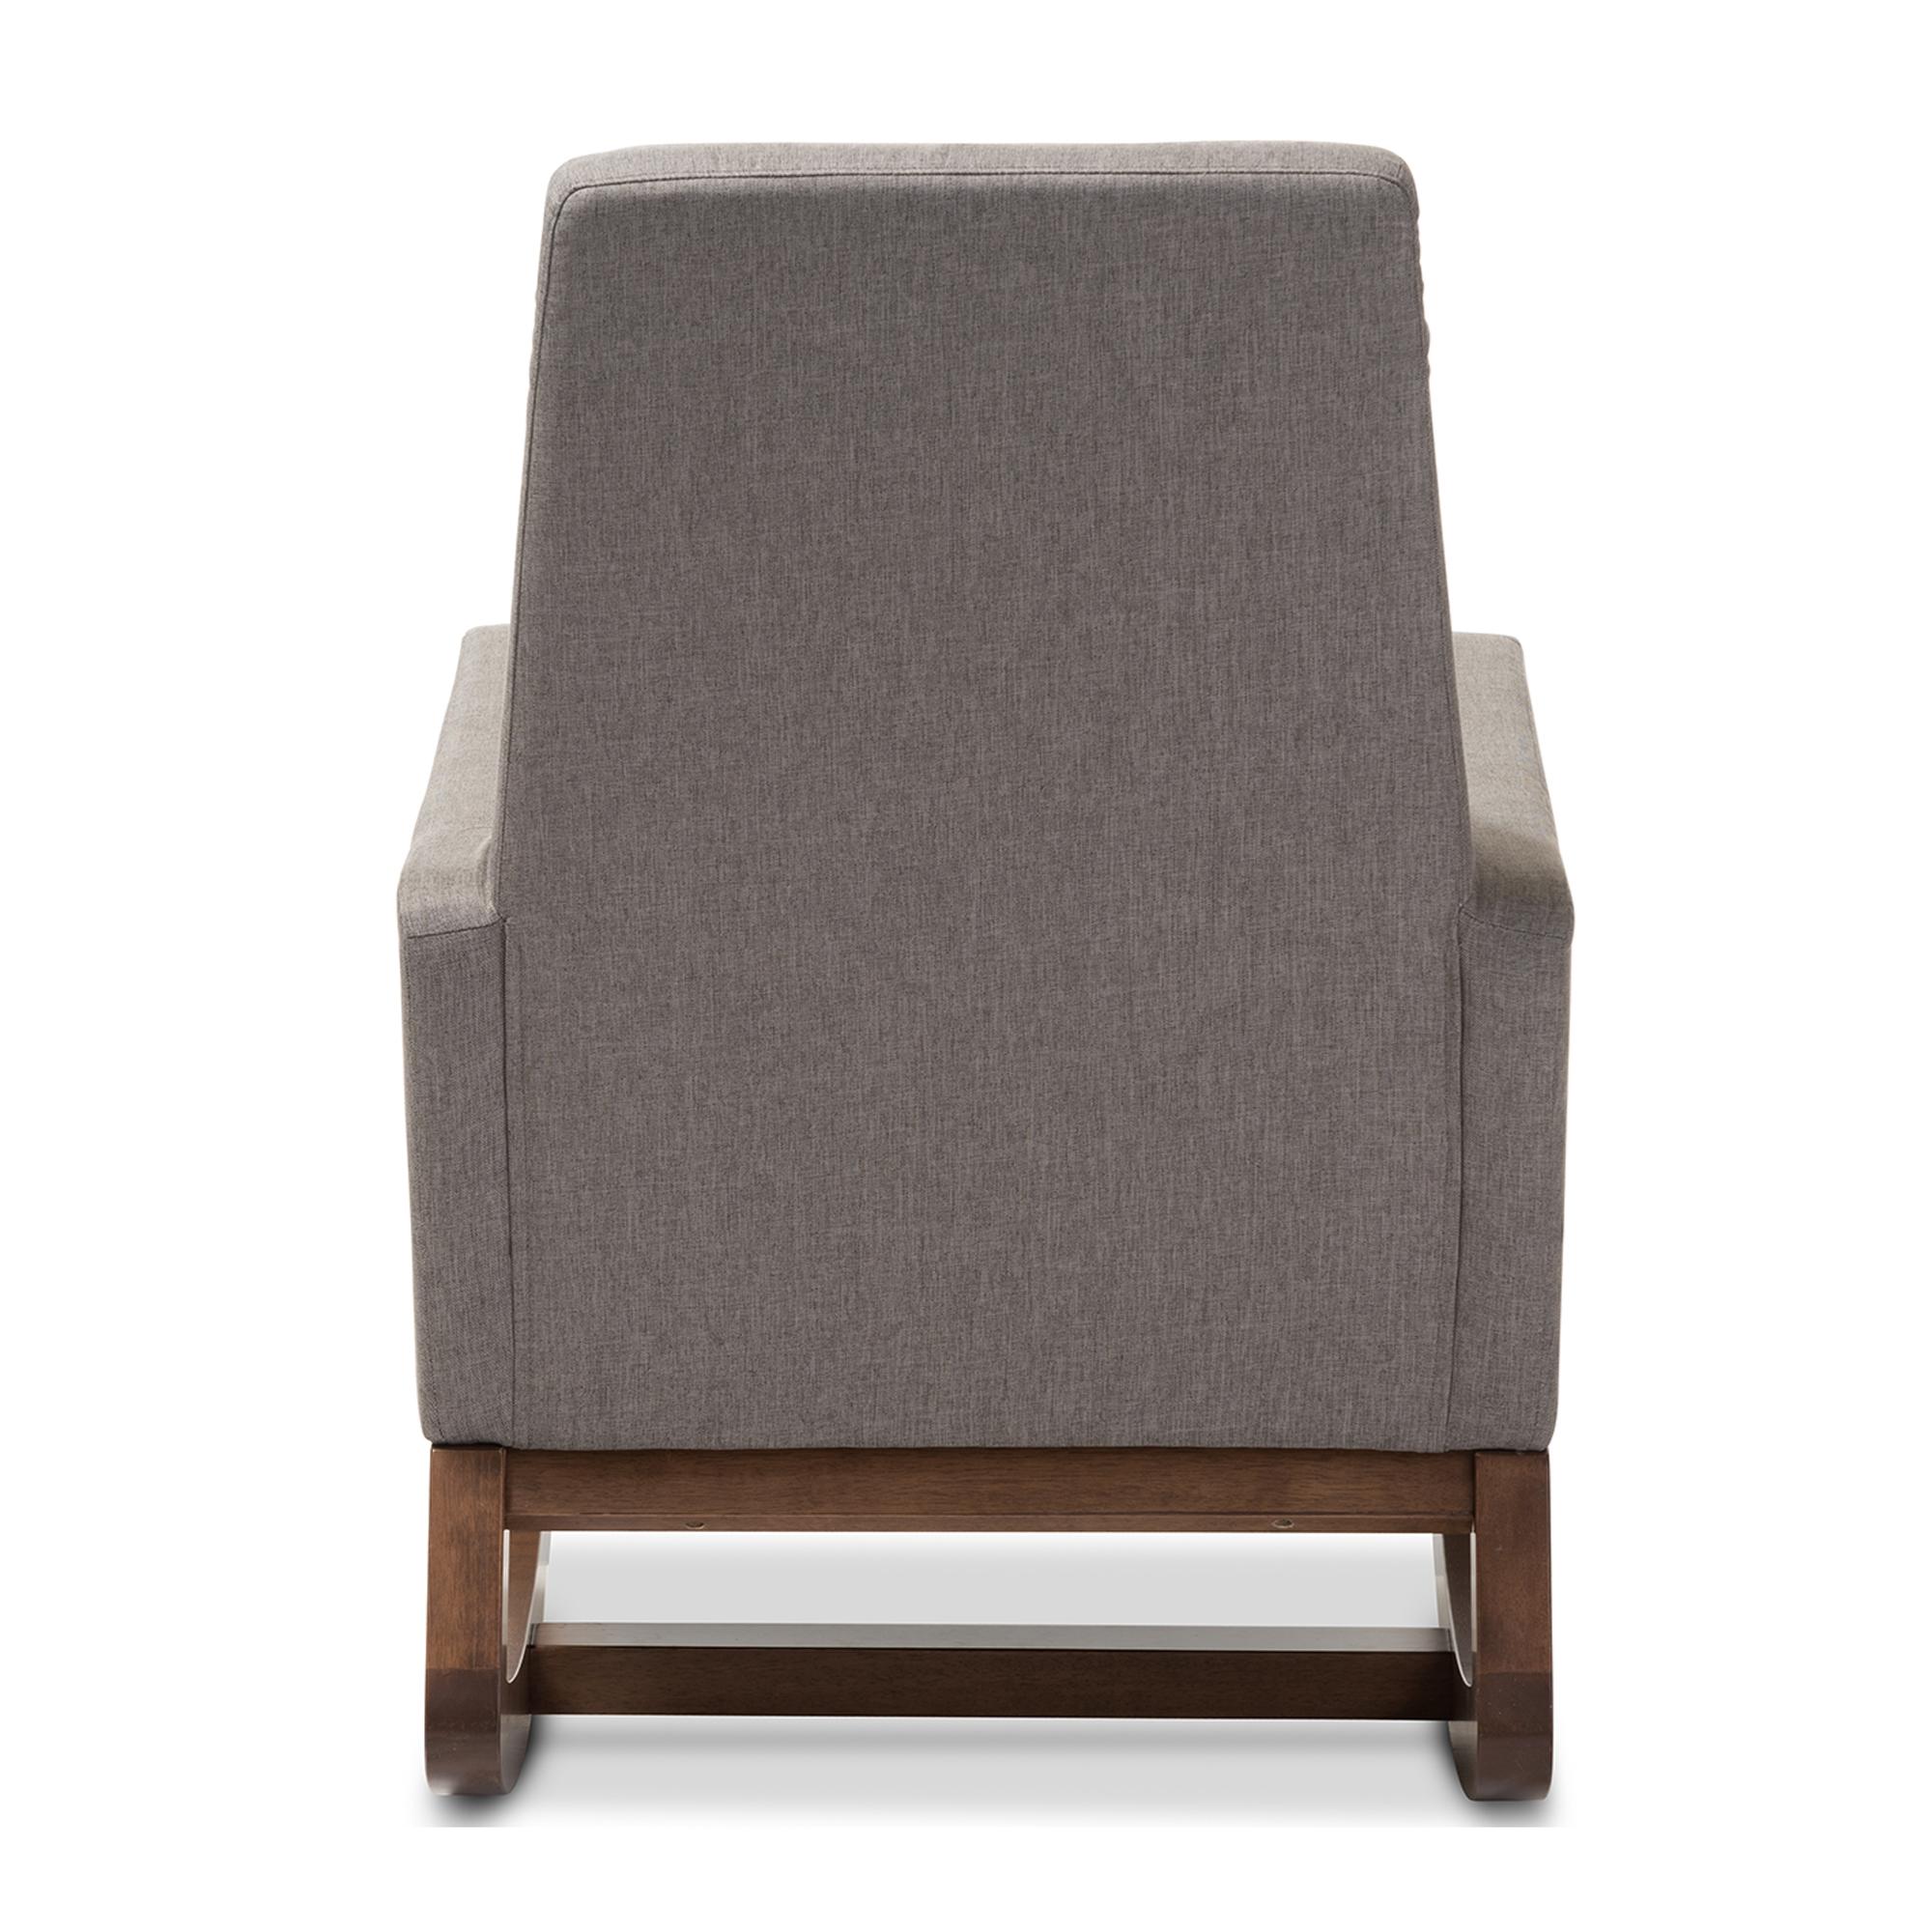 ... Baxton Studio Yashiya Mid Century Retro Modern Grey Fabric Upholstered  Rocking Chair   IEBBT5199  ...